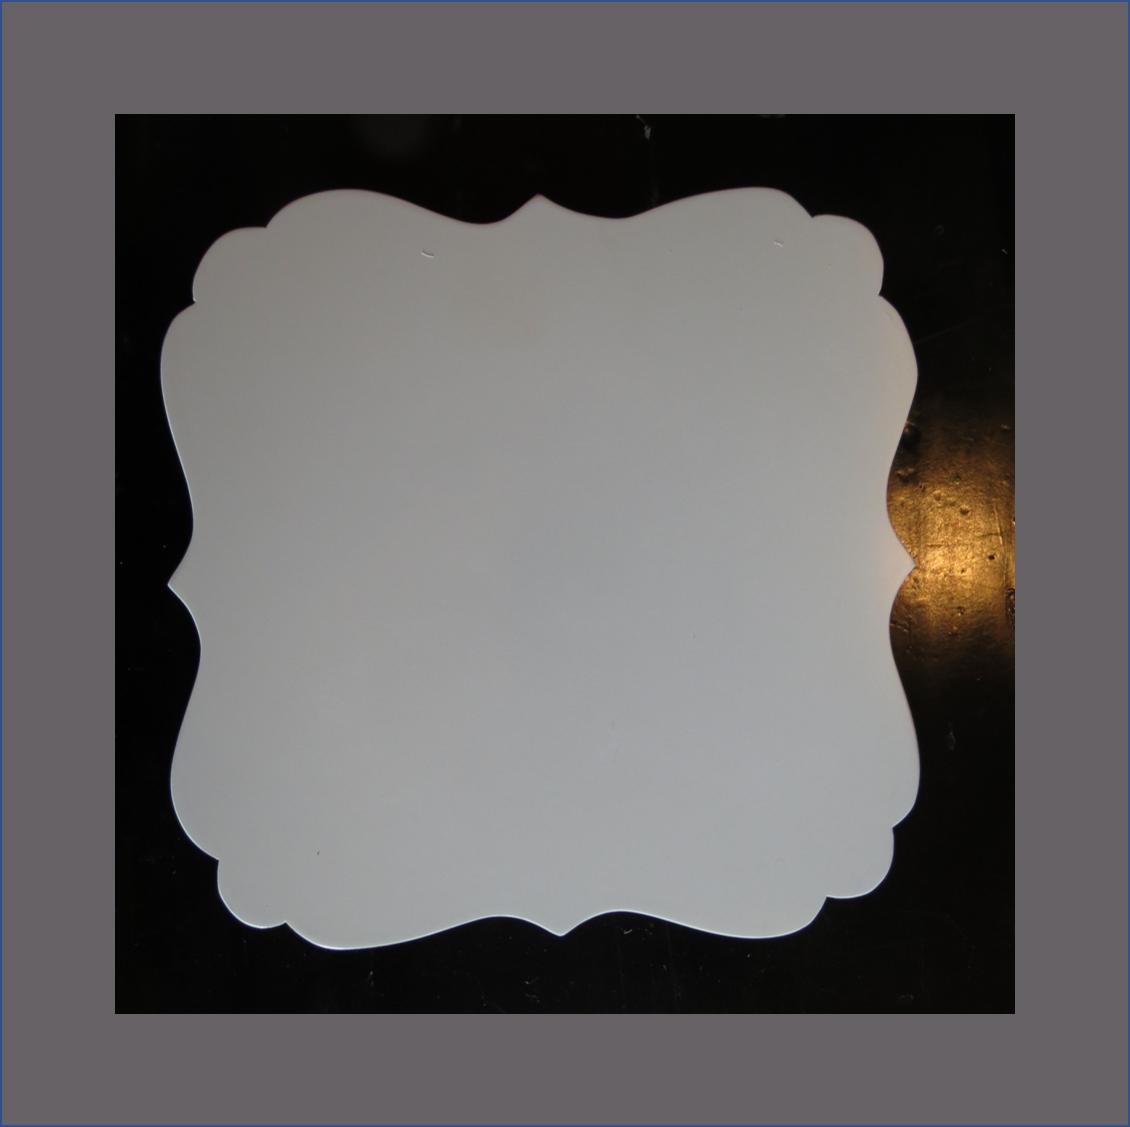 white-square-damask-underplate